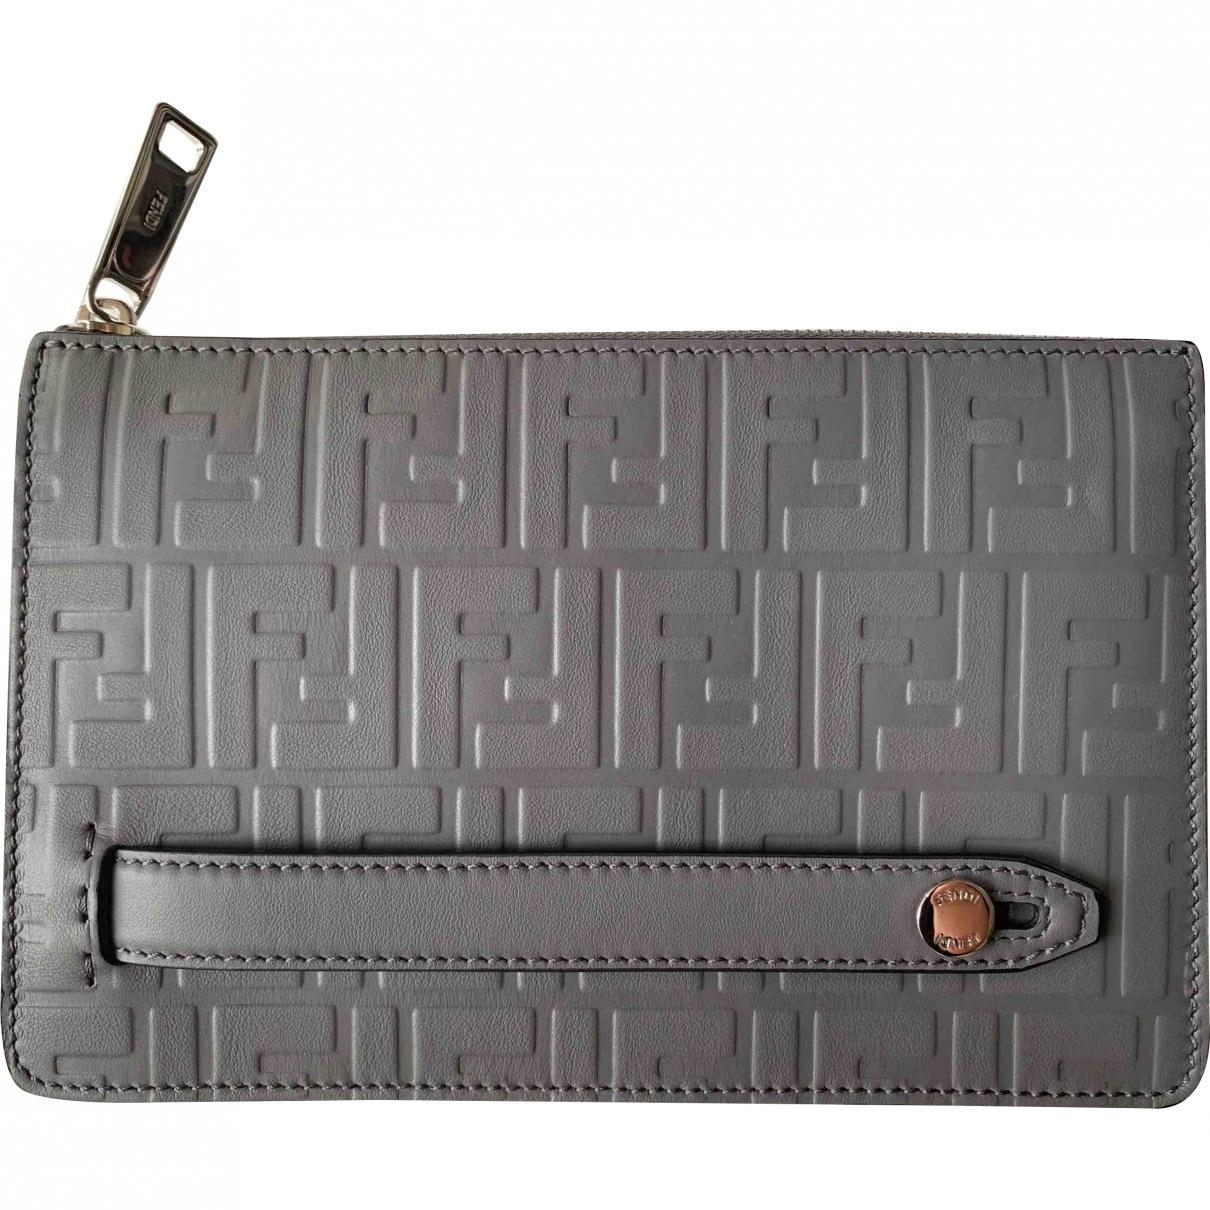 Fendi \N Grey Leather Small bag, wallet & cases for Men \N